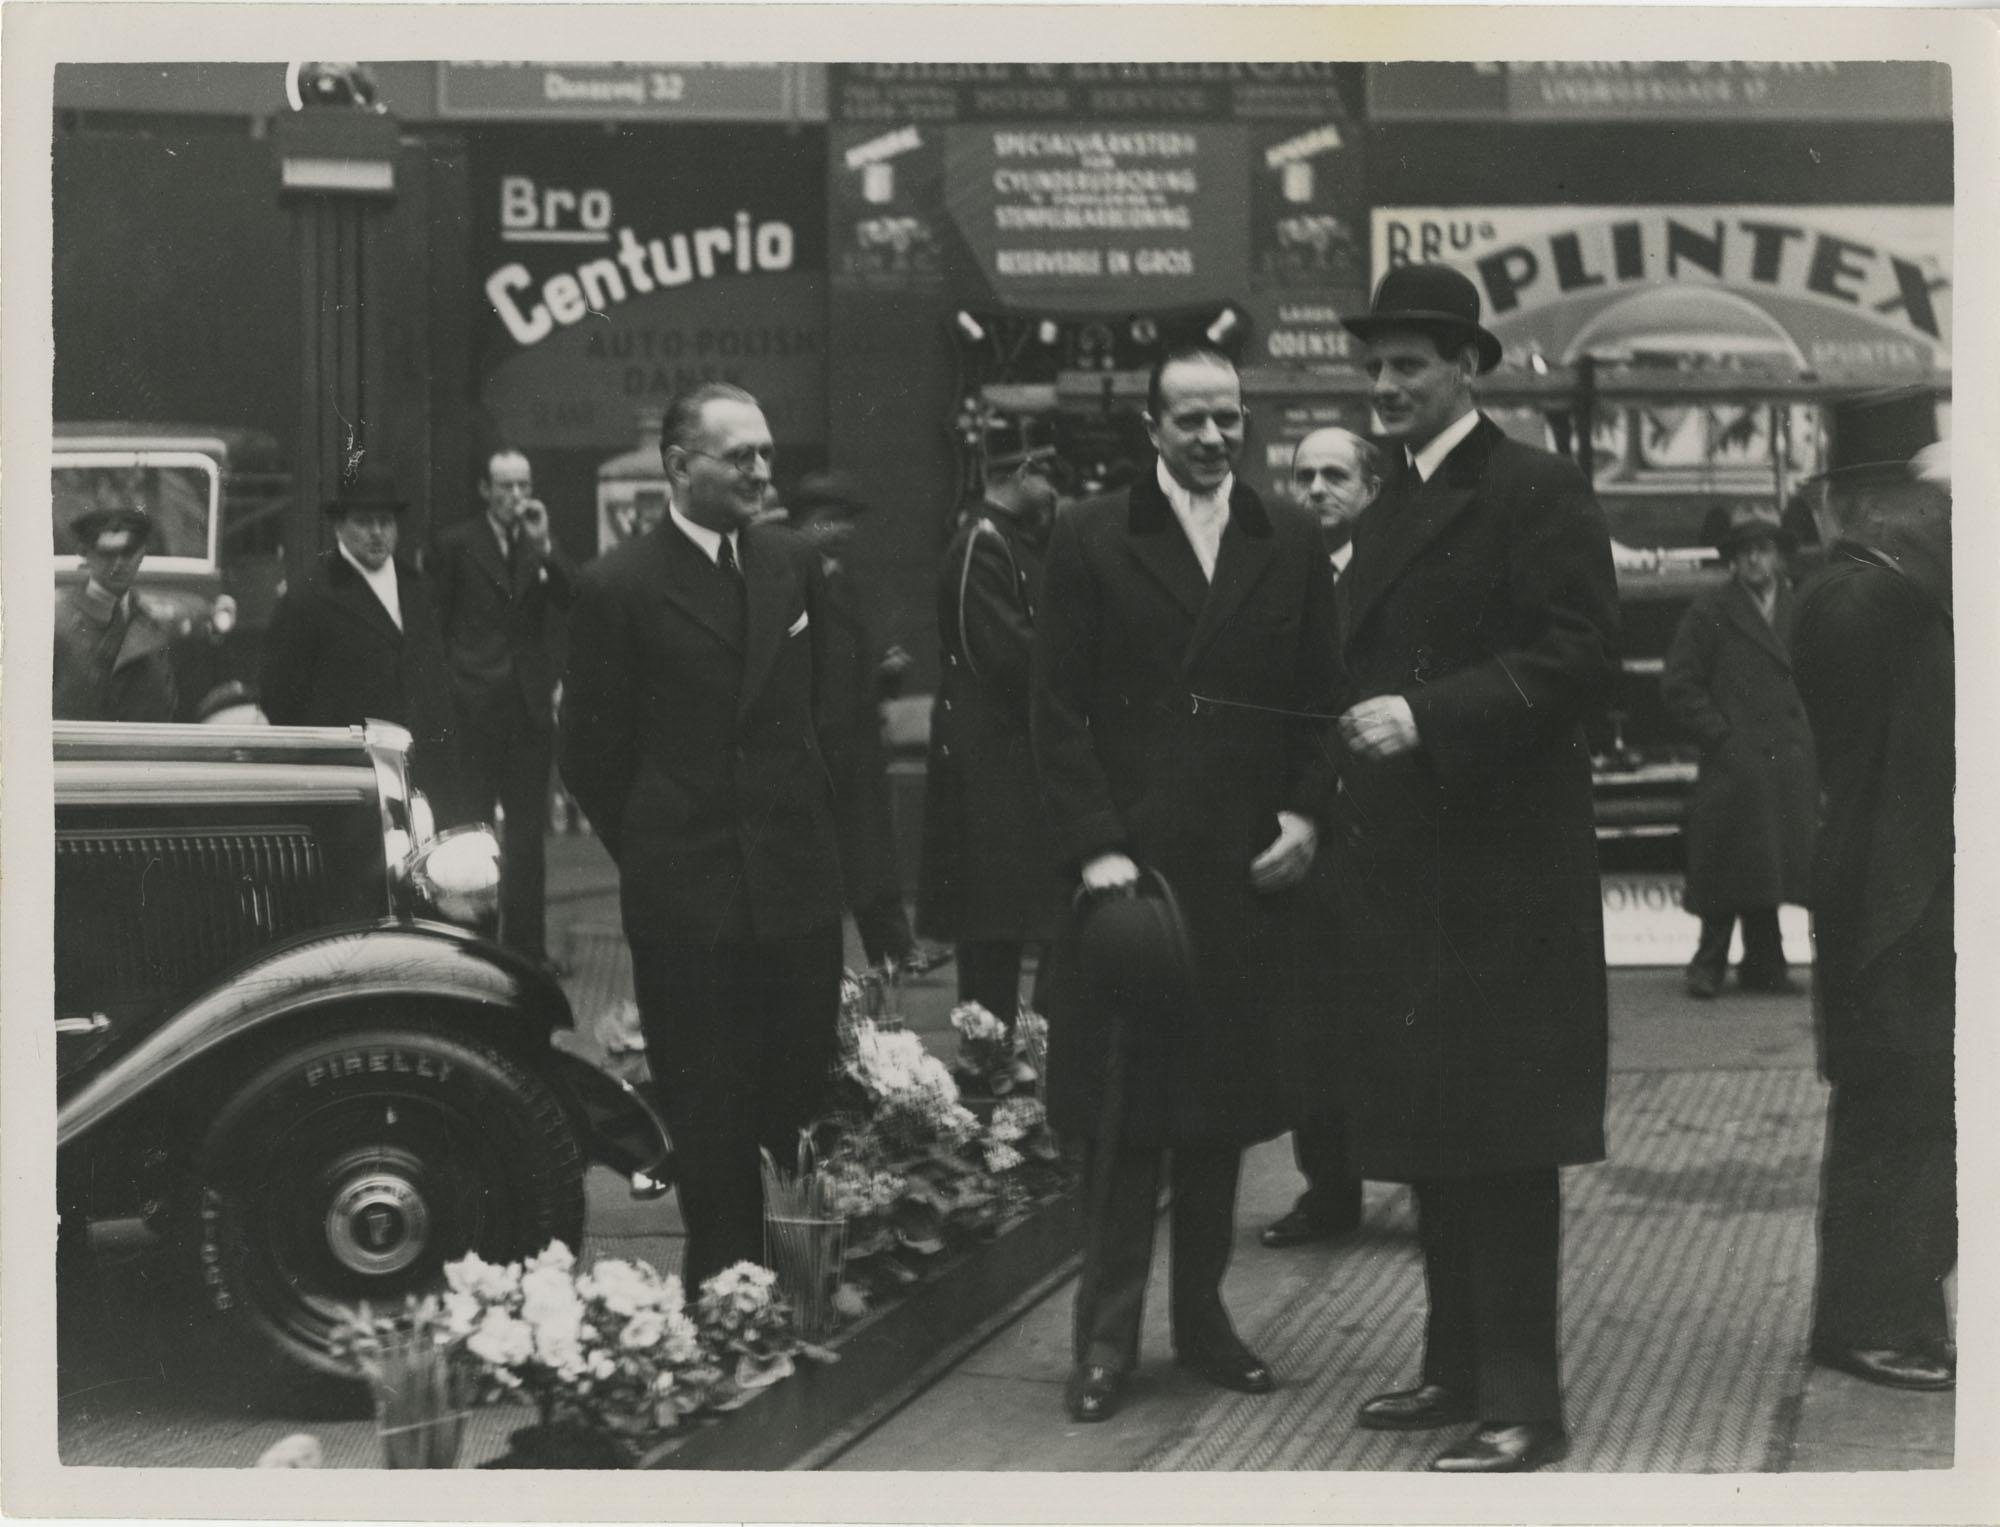 Mario Pansa and friends in Copenhagen, Photograph 2